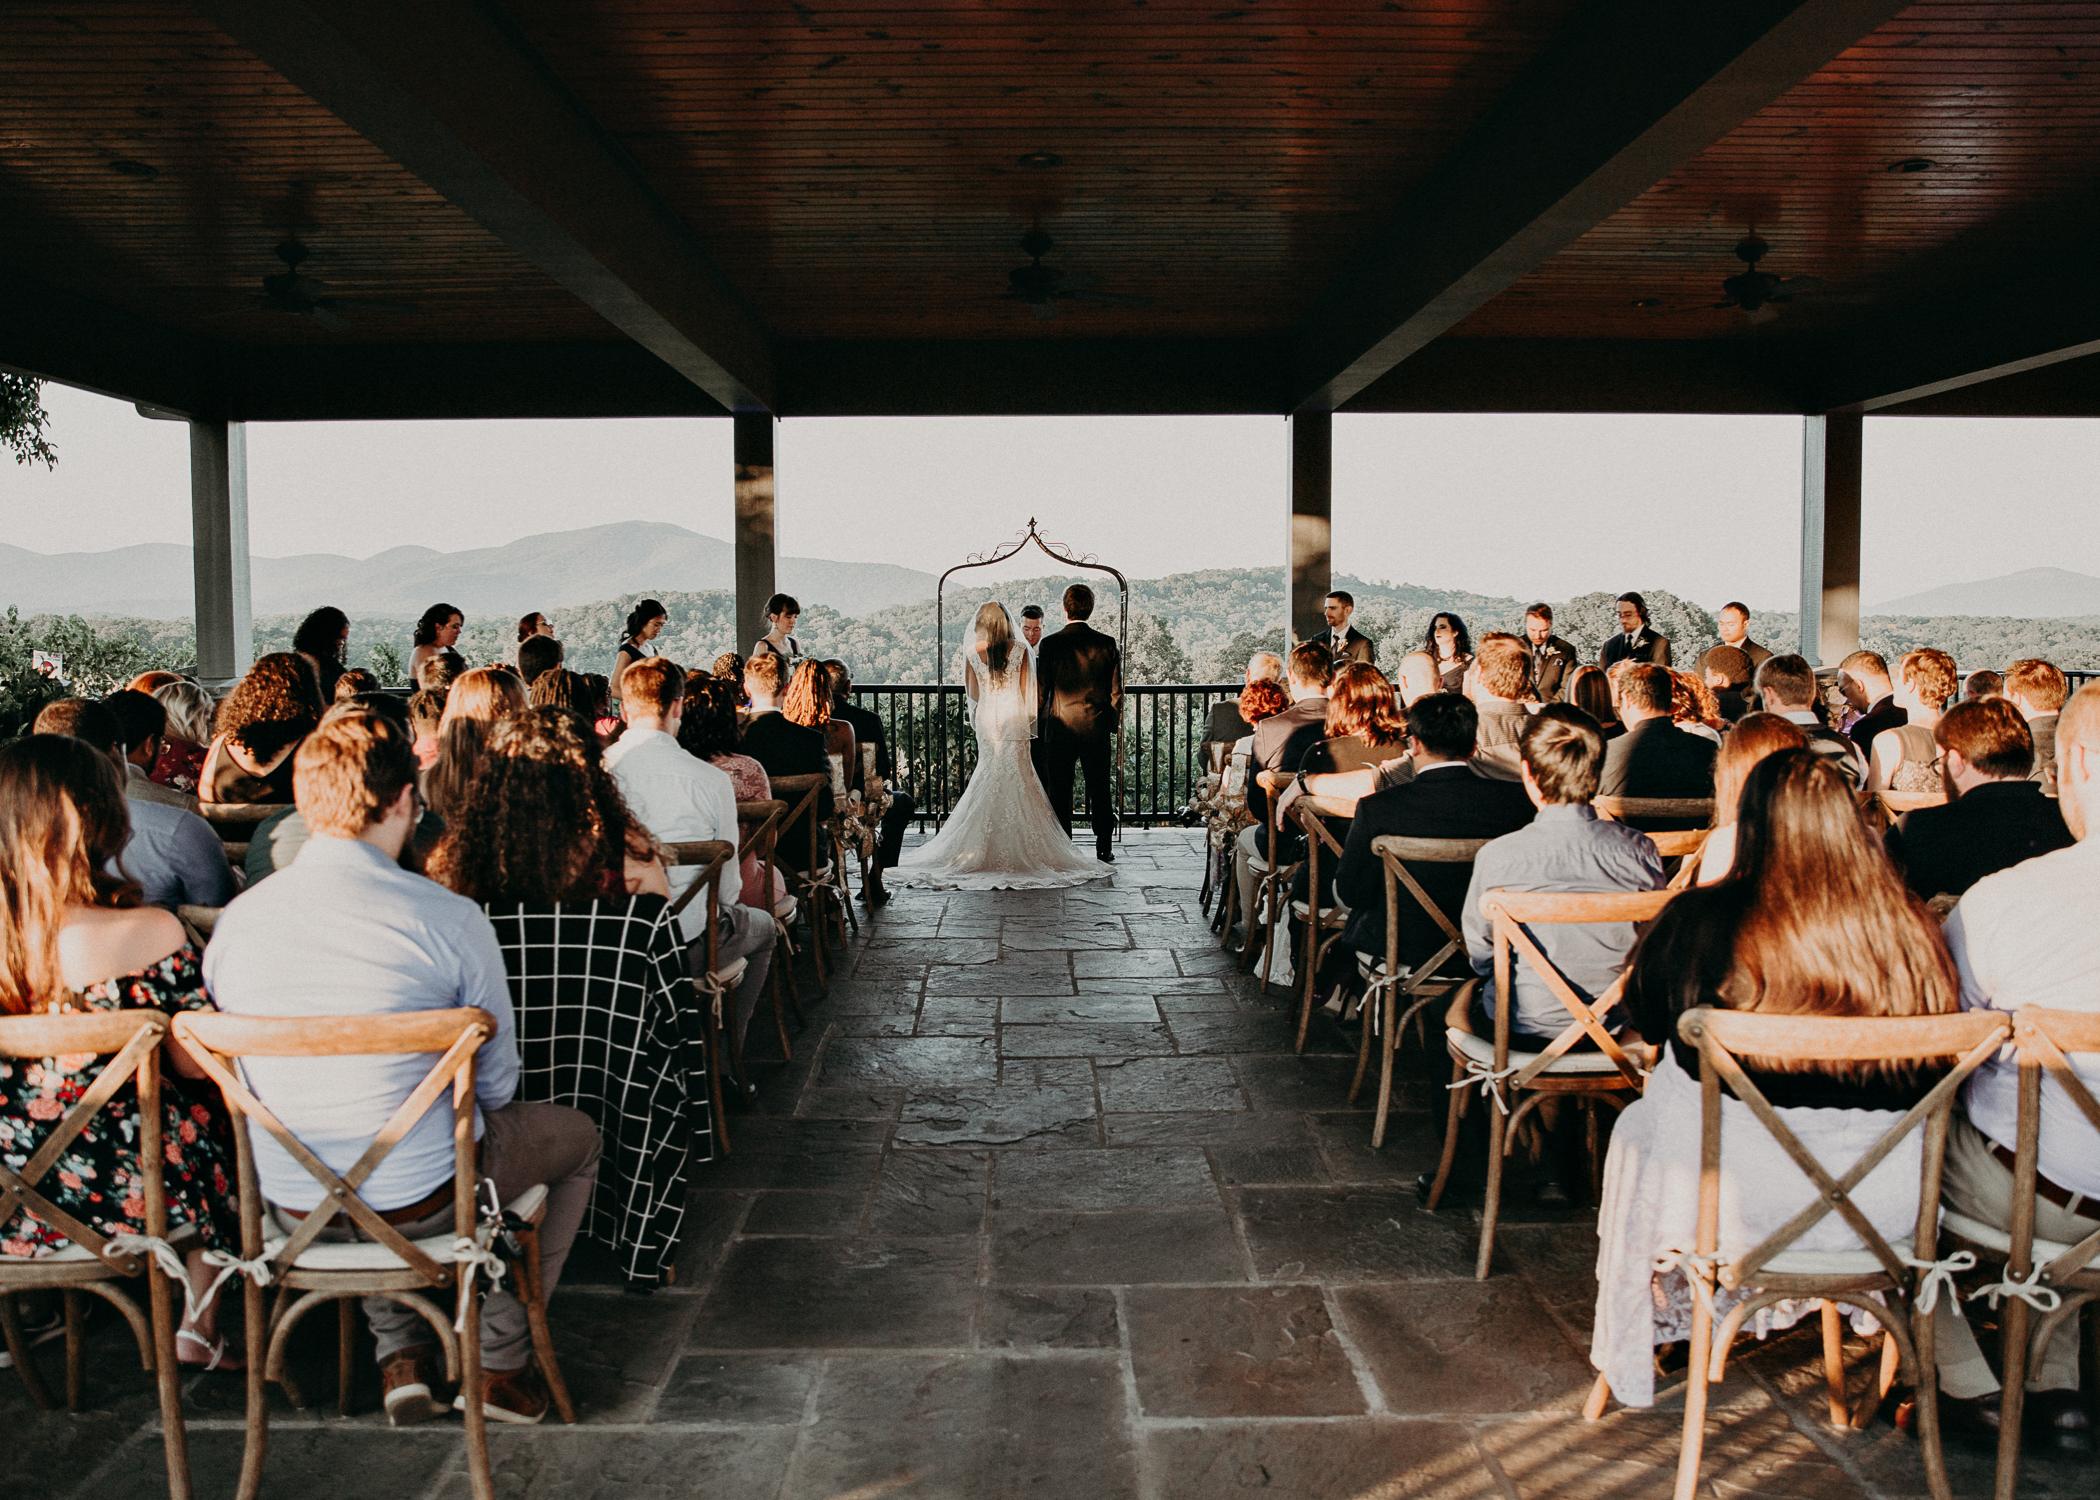 70- Kaya_vineyard_dahlonega_wedding_venue_ceremony_aline_marin_photography.jpg